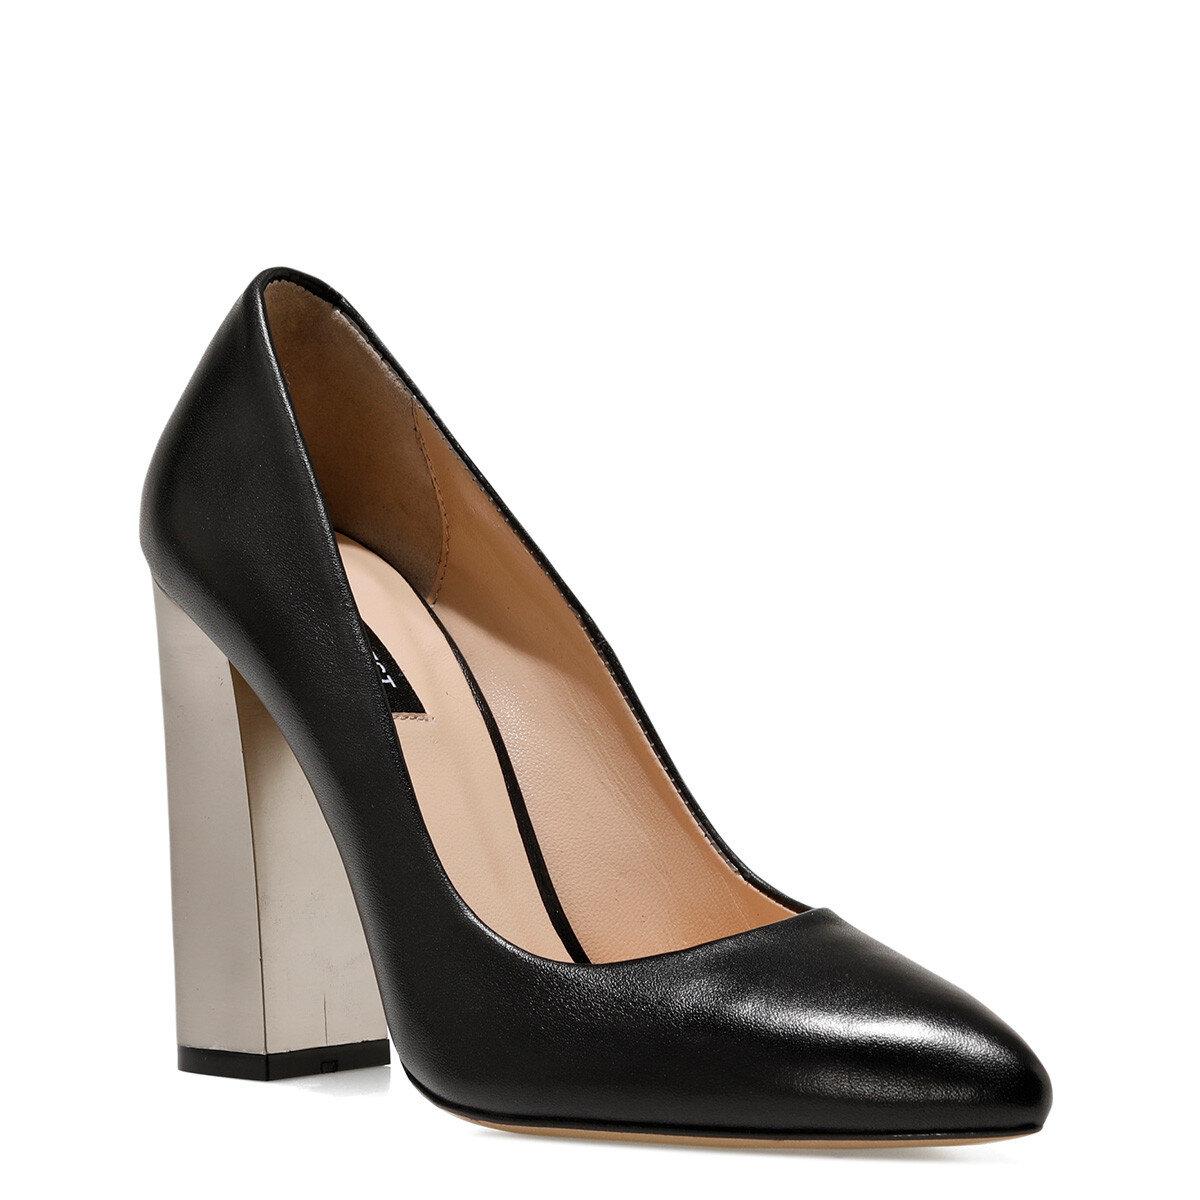 CLAIA Siyah Kadın Stiletto